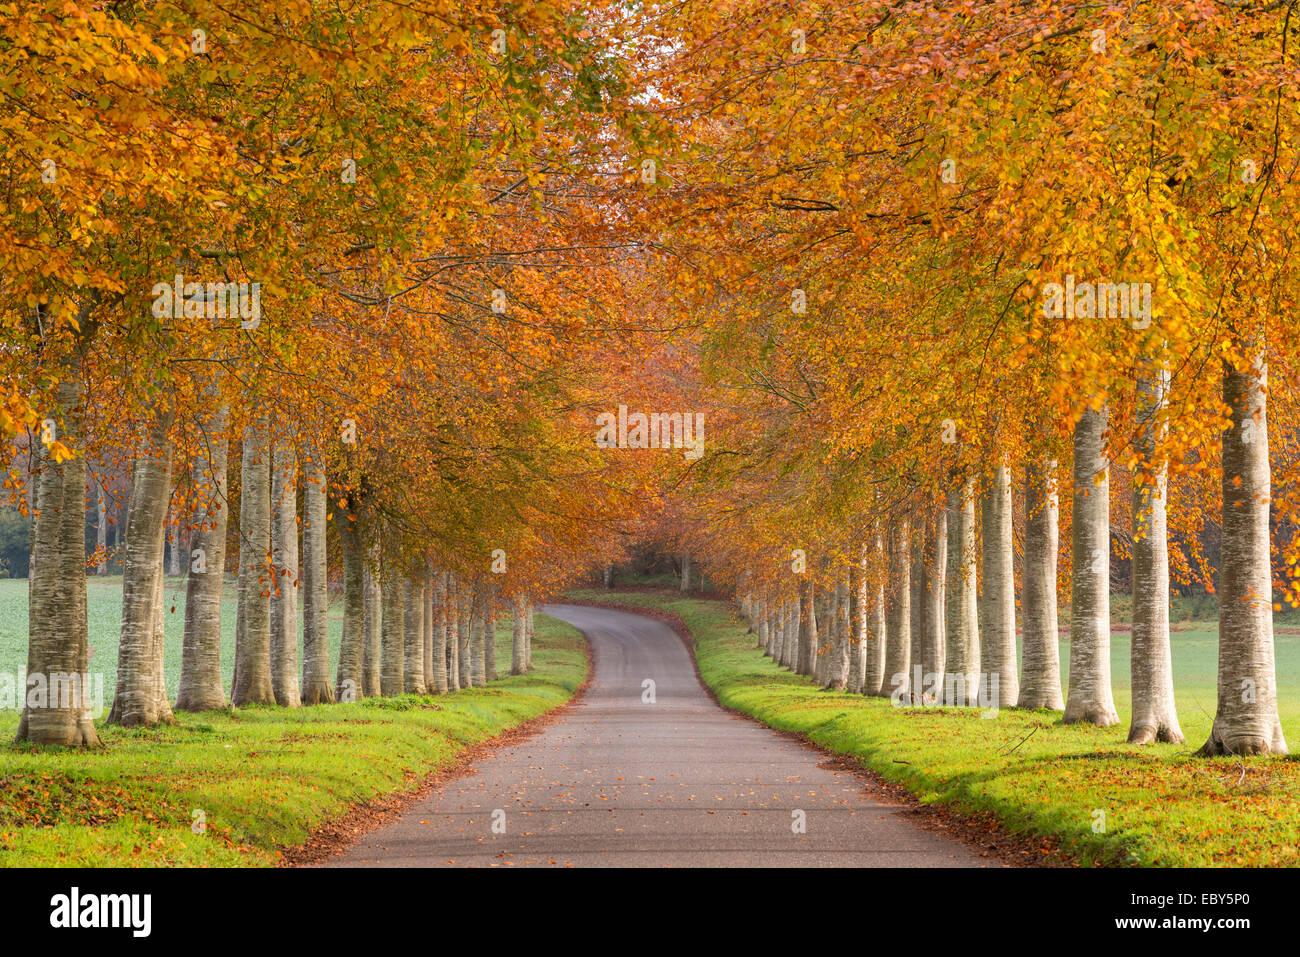 Avenue of colourful trees in autumn, Dorset, England. November 2014. - Stock Image